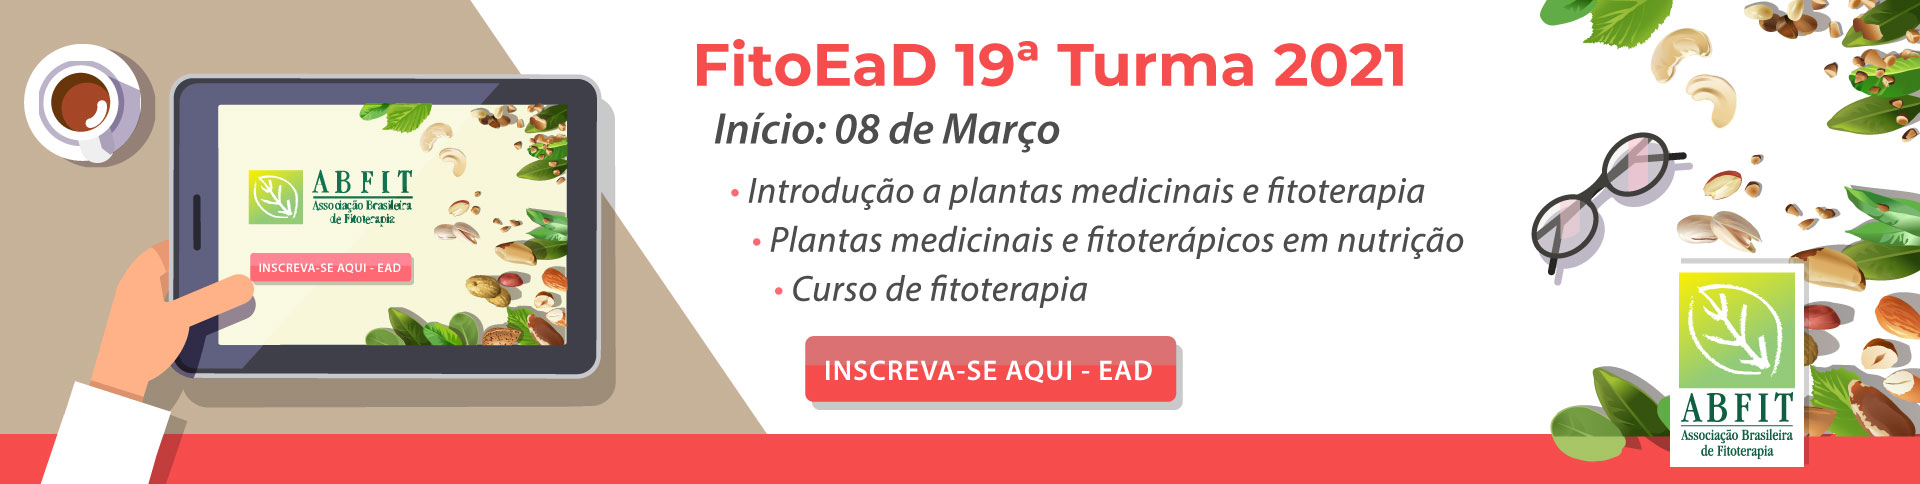 banner-post-fitoead-19a-turma-e-extensao-2021-03-2210121.jpg